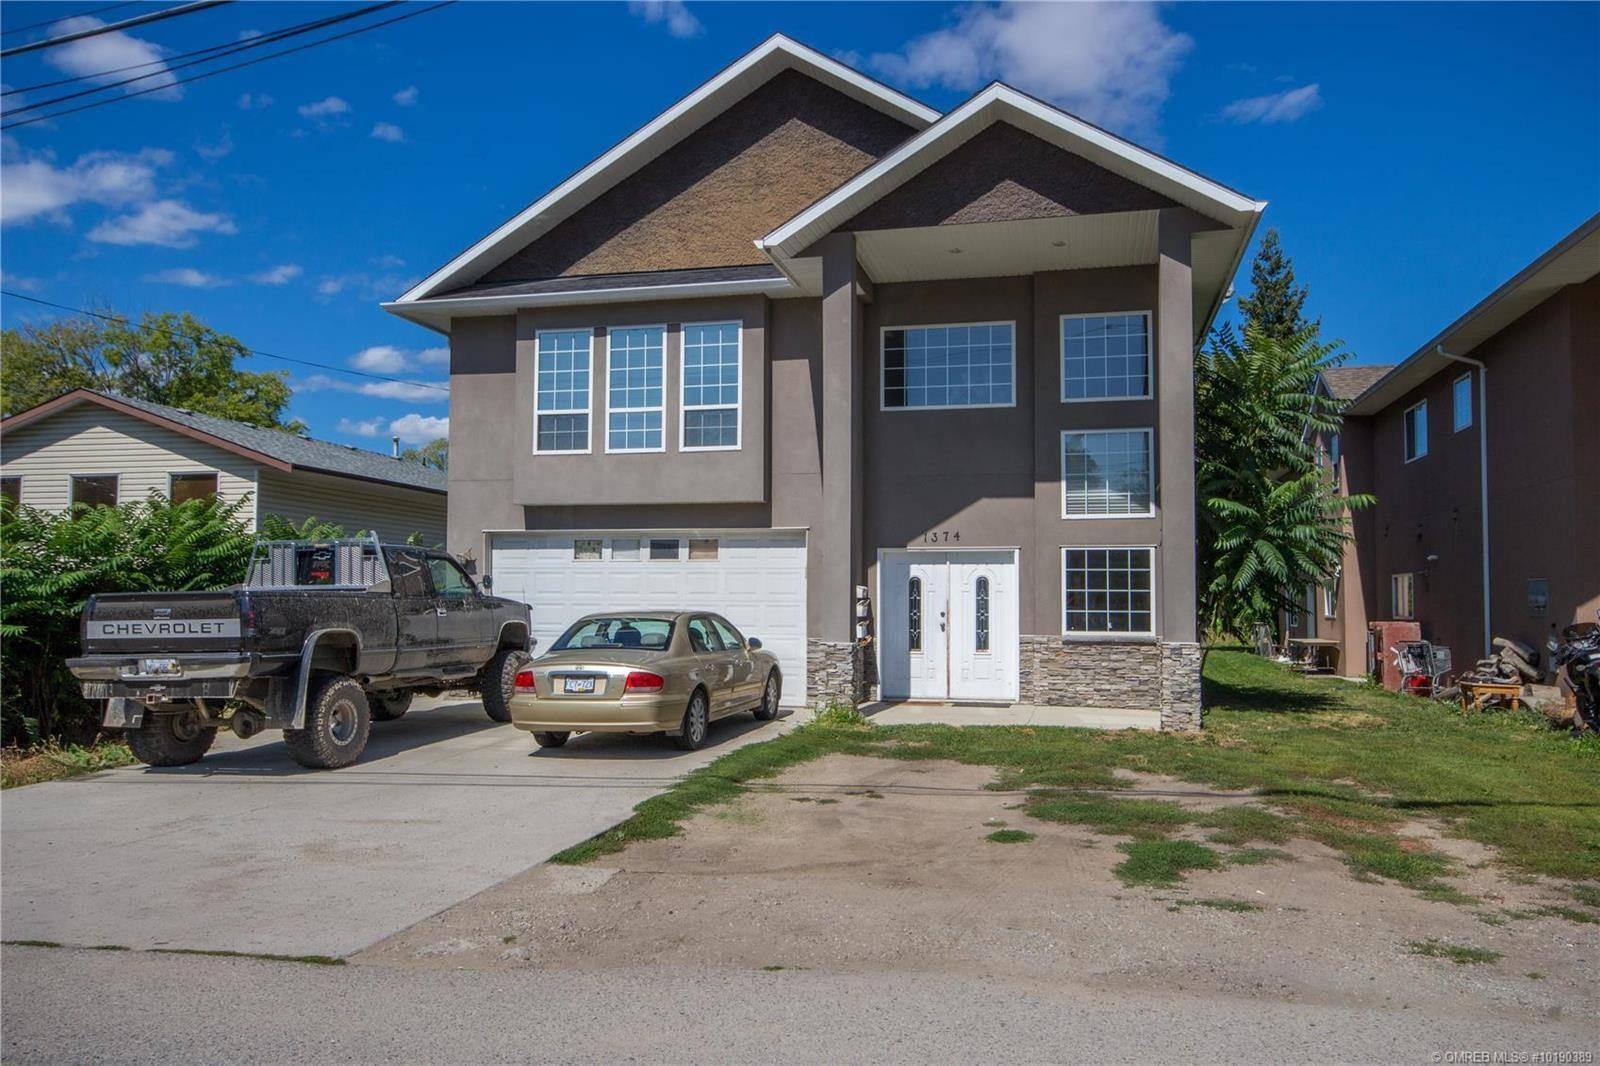 House for sale at 1374 Mcinnes Ave Kelowna British Columbia - MLS: 10190389